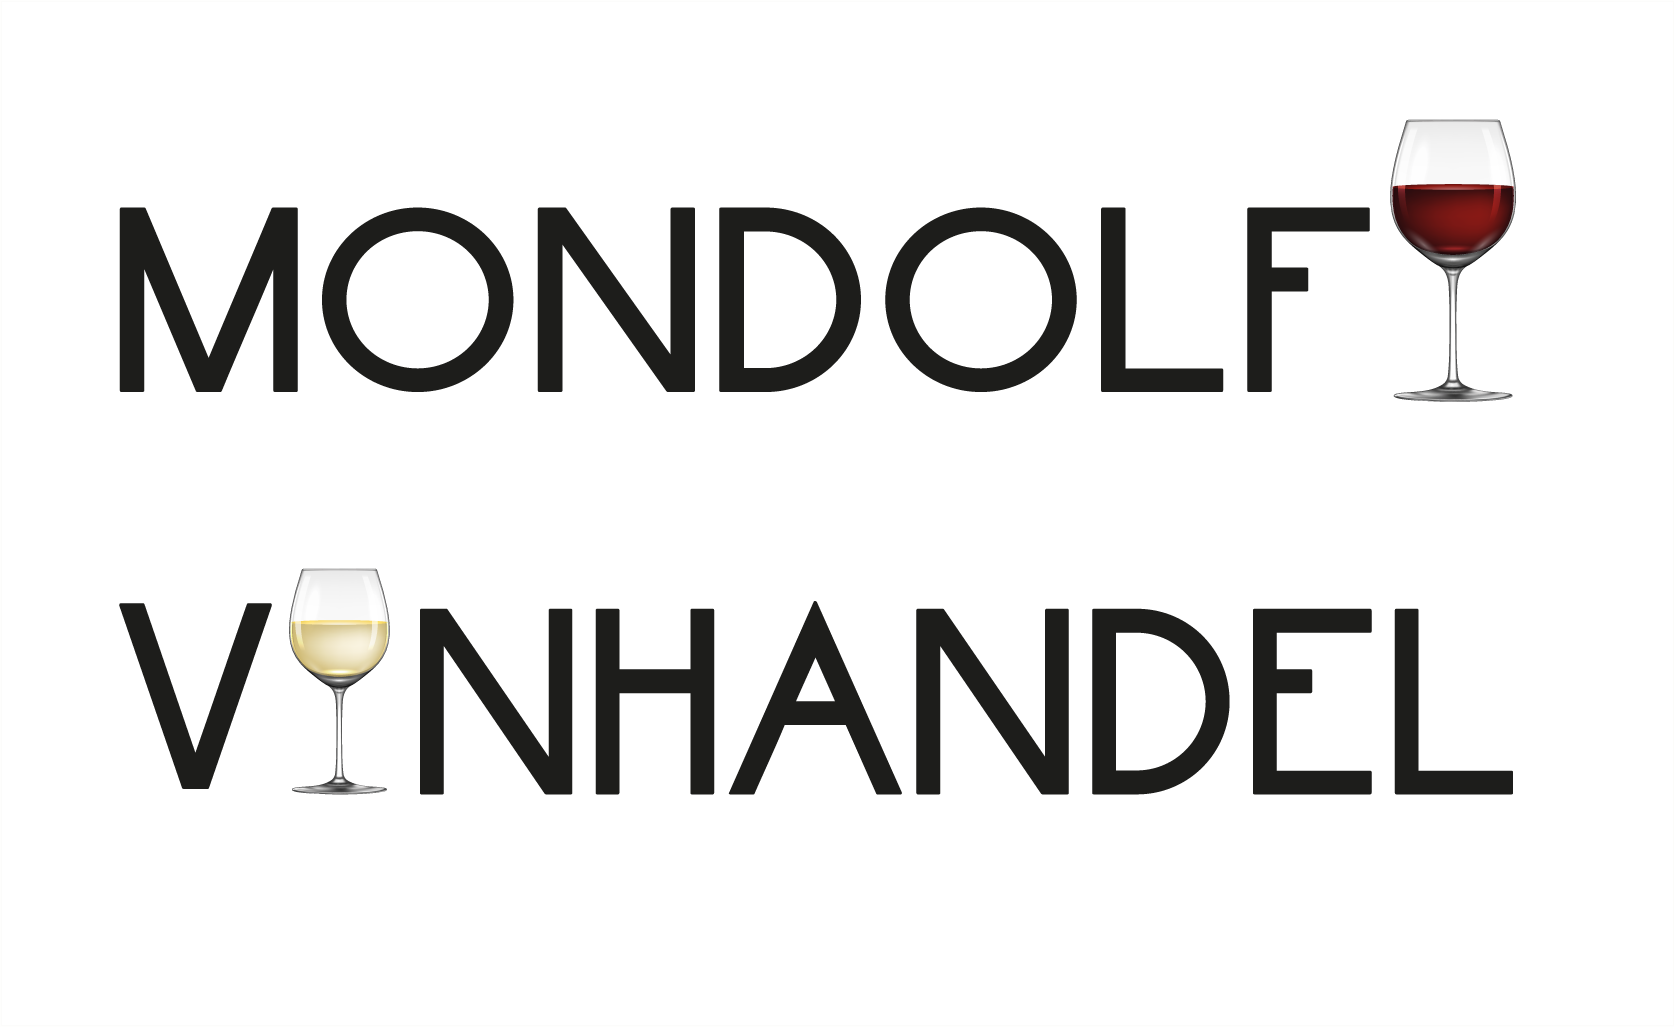 Mondolfi Vinhandel logo